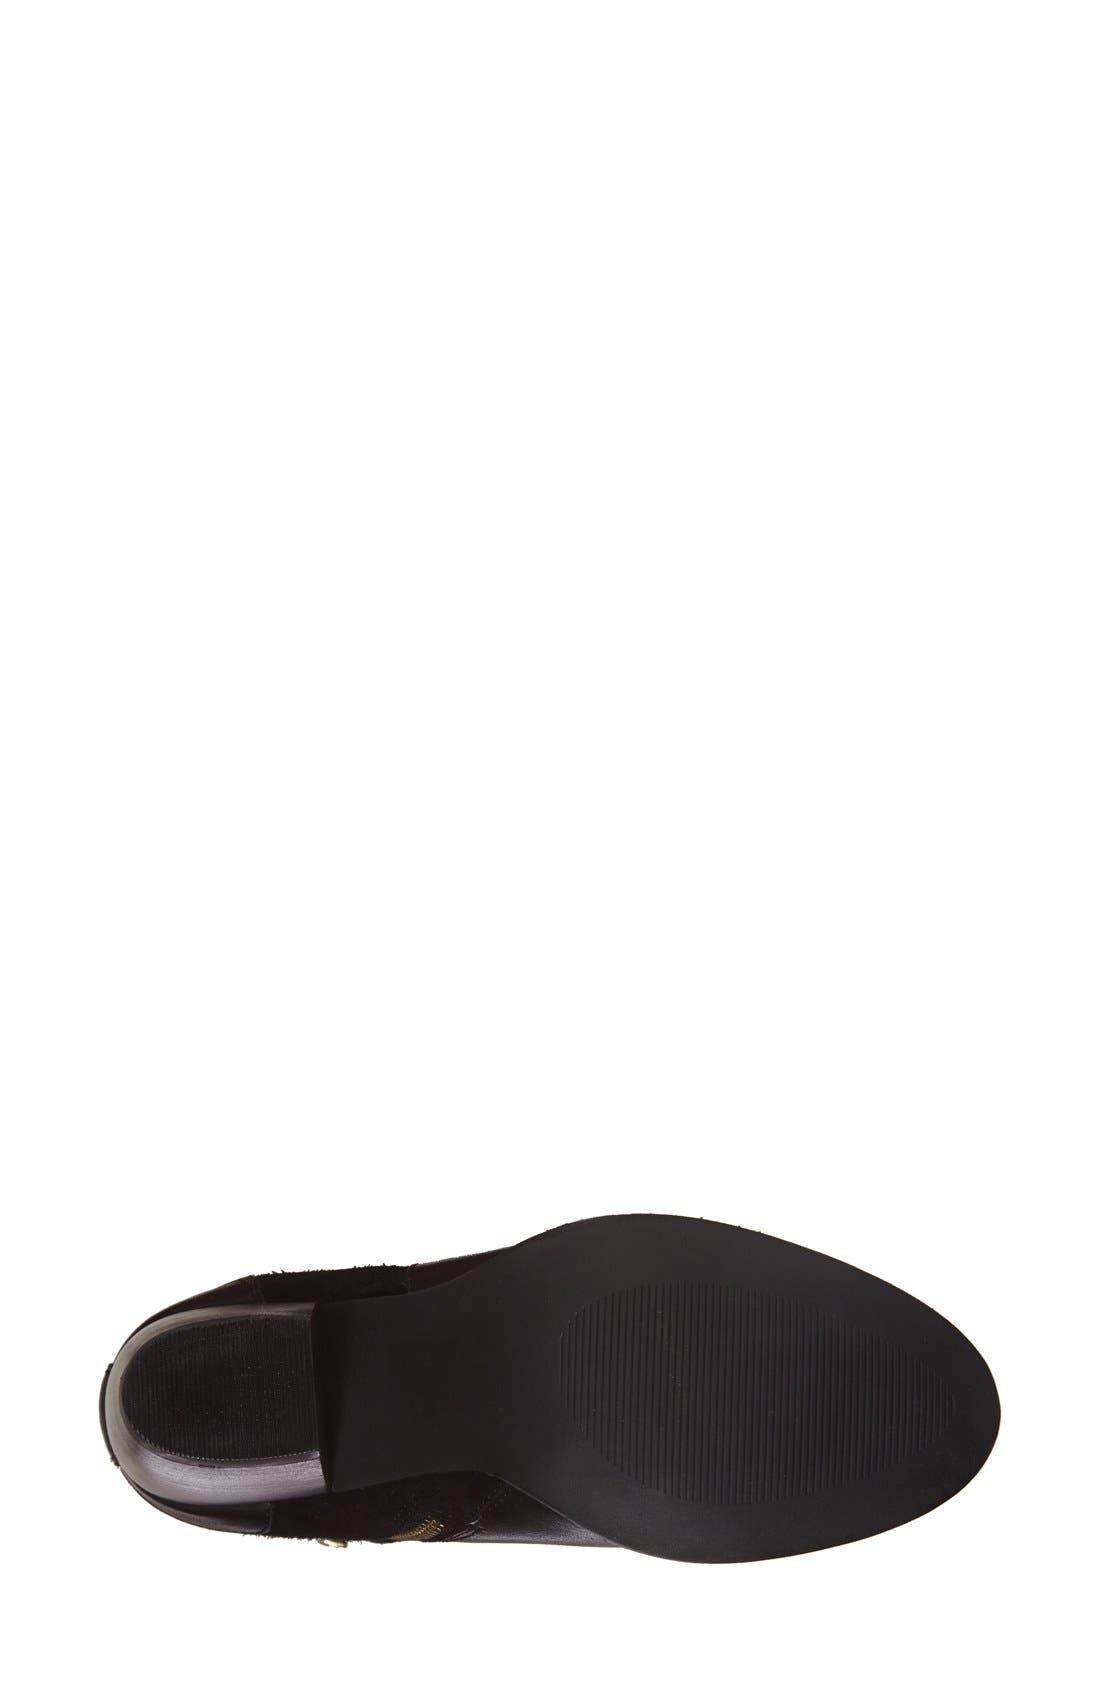 'Parmar' Chunky Heel Bootie,                             Alternate thumbnail 4, color,                             Black